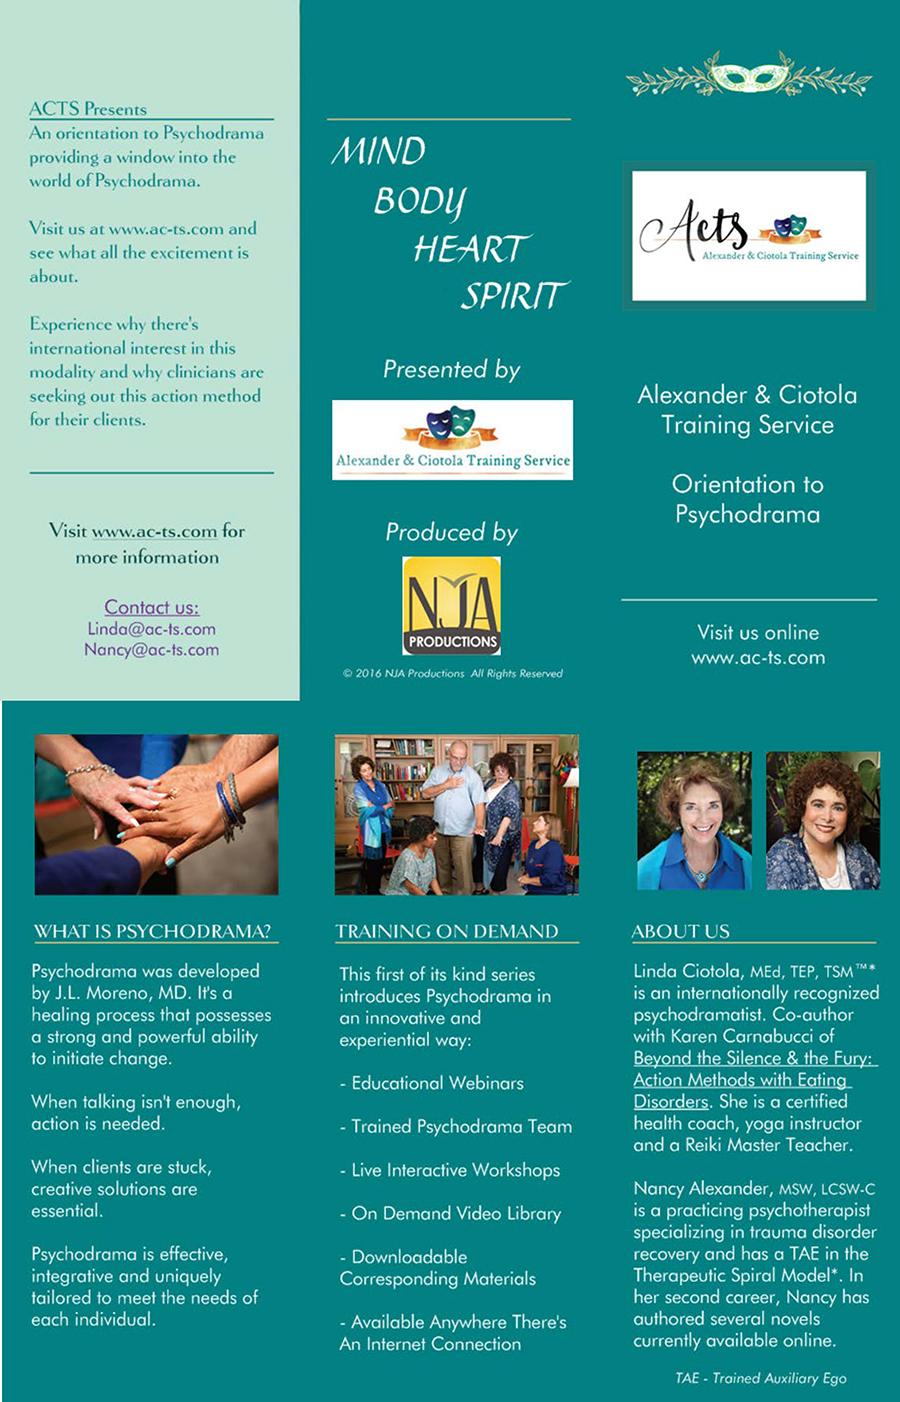 ACTS Training Services - Alexander & Ciotola Traing Serivces